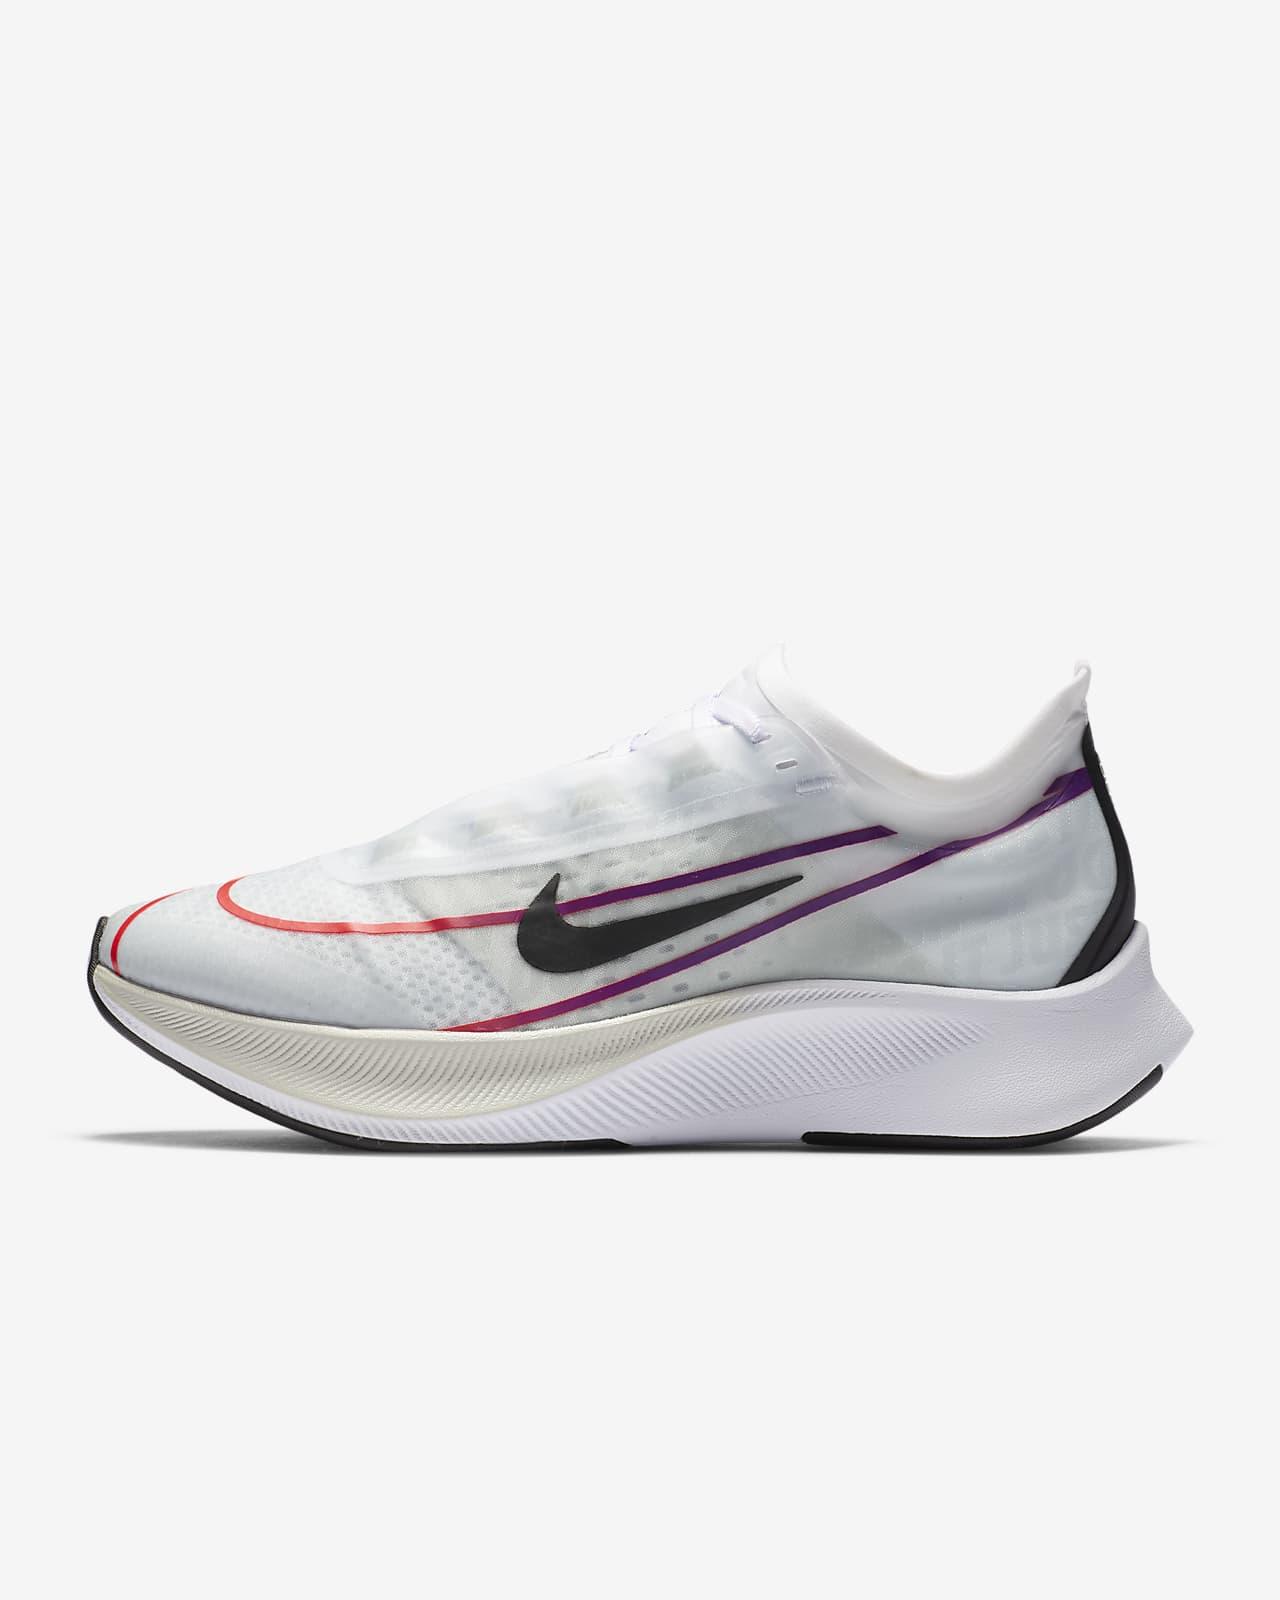 nike chaussure femme running